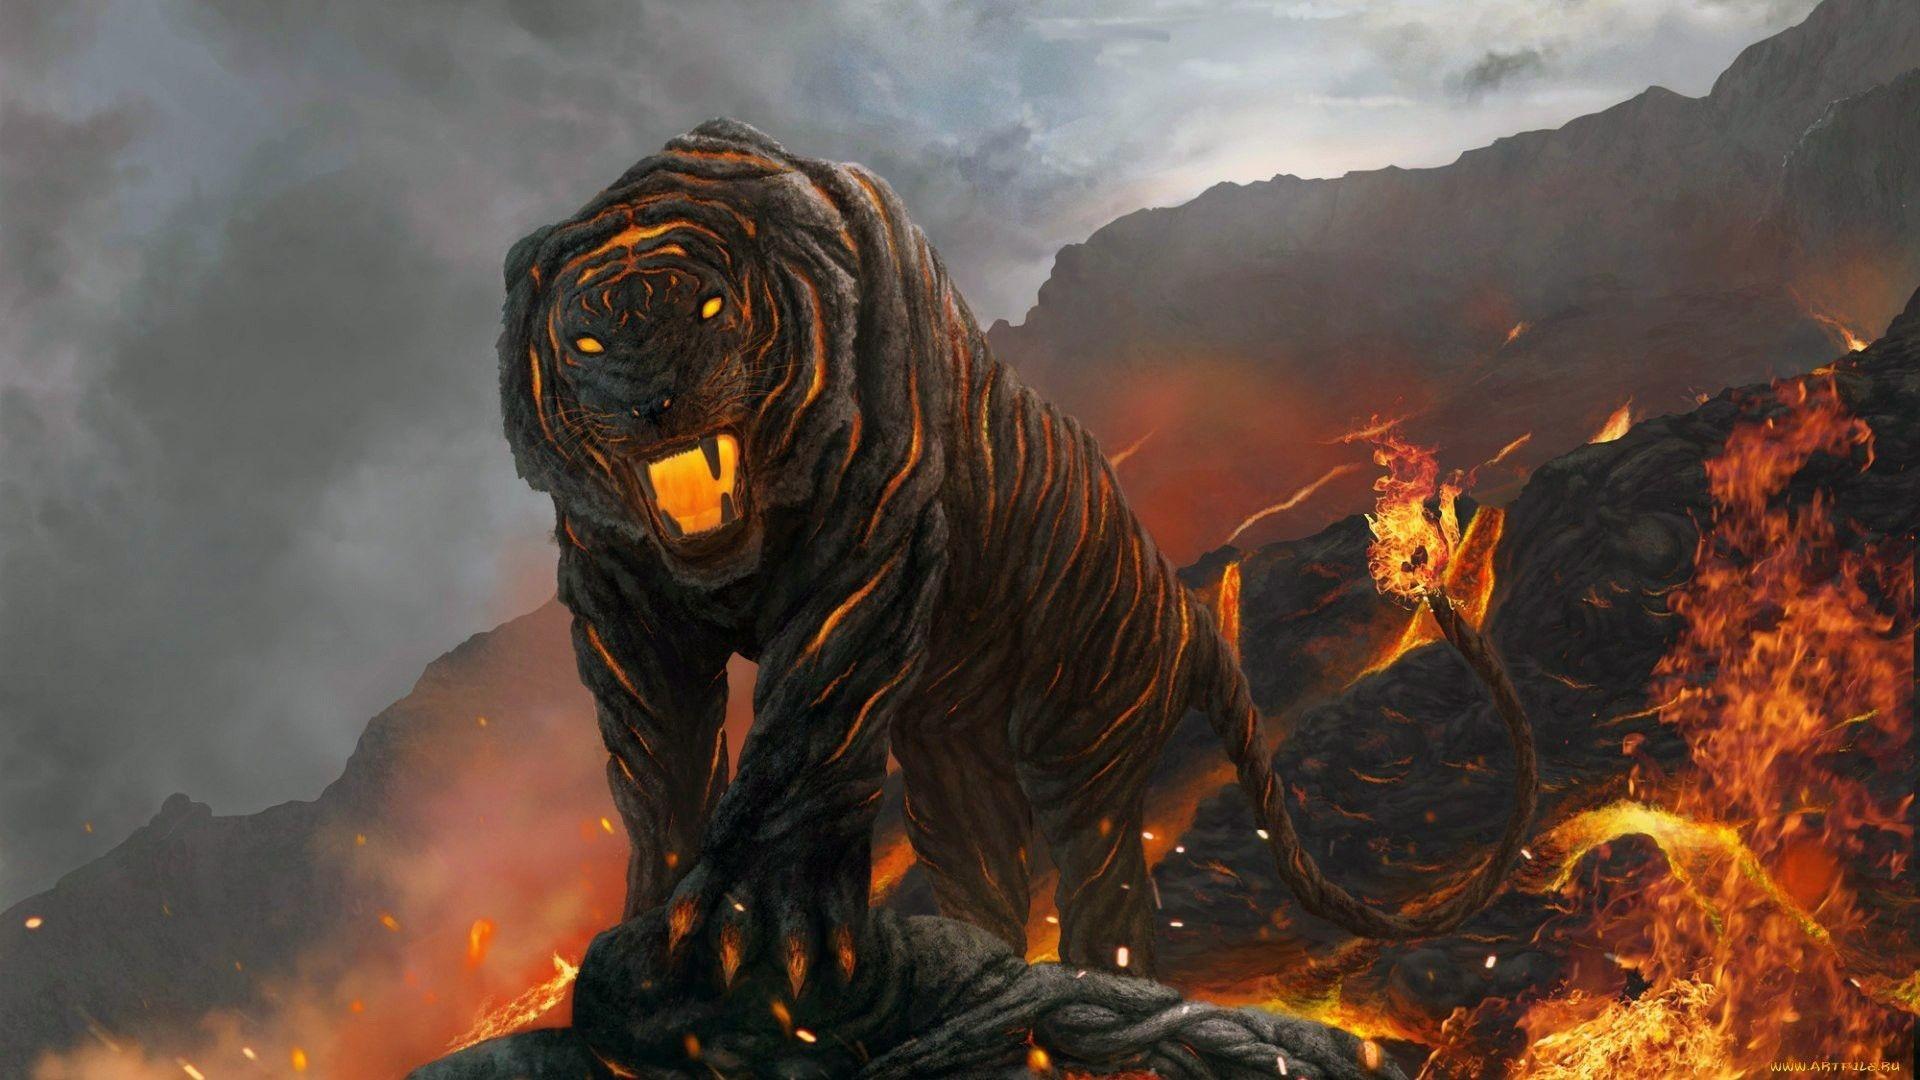 Best 3D Tiger for Computer Wallpaper Wallpaper, Size: .